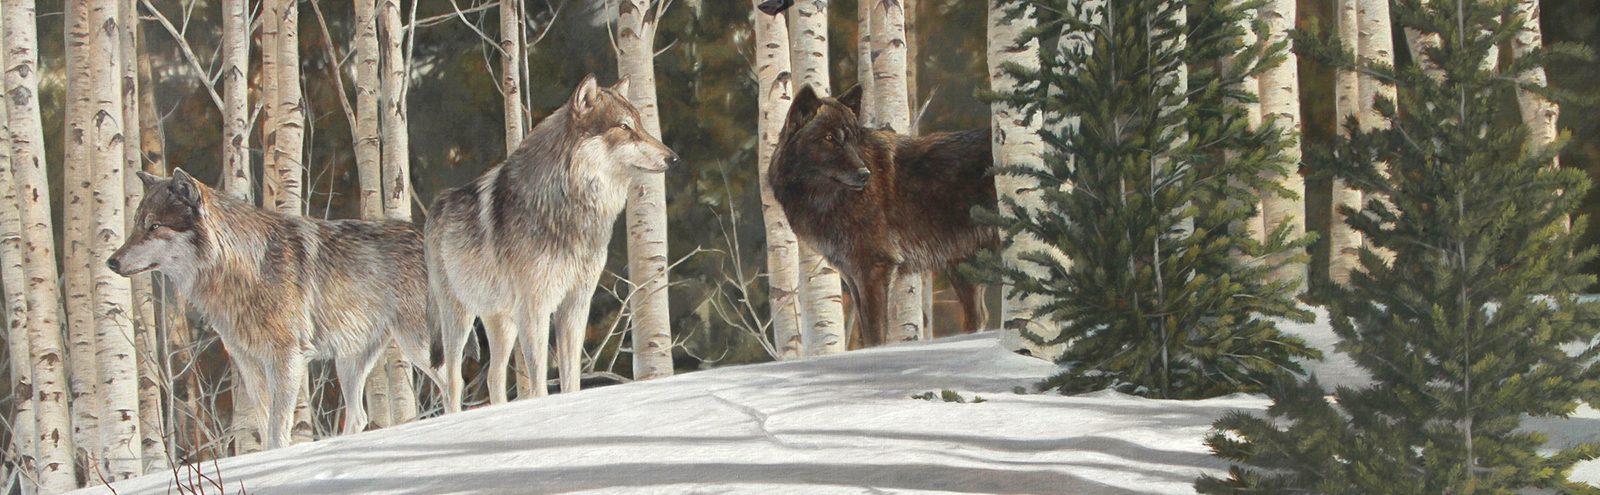 Wolf Awareness Week poster